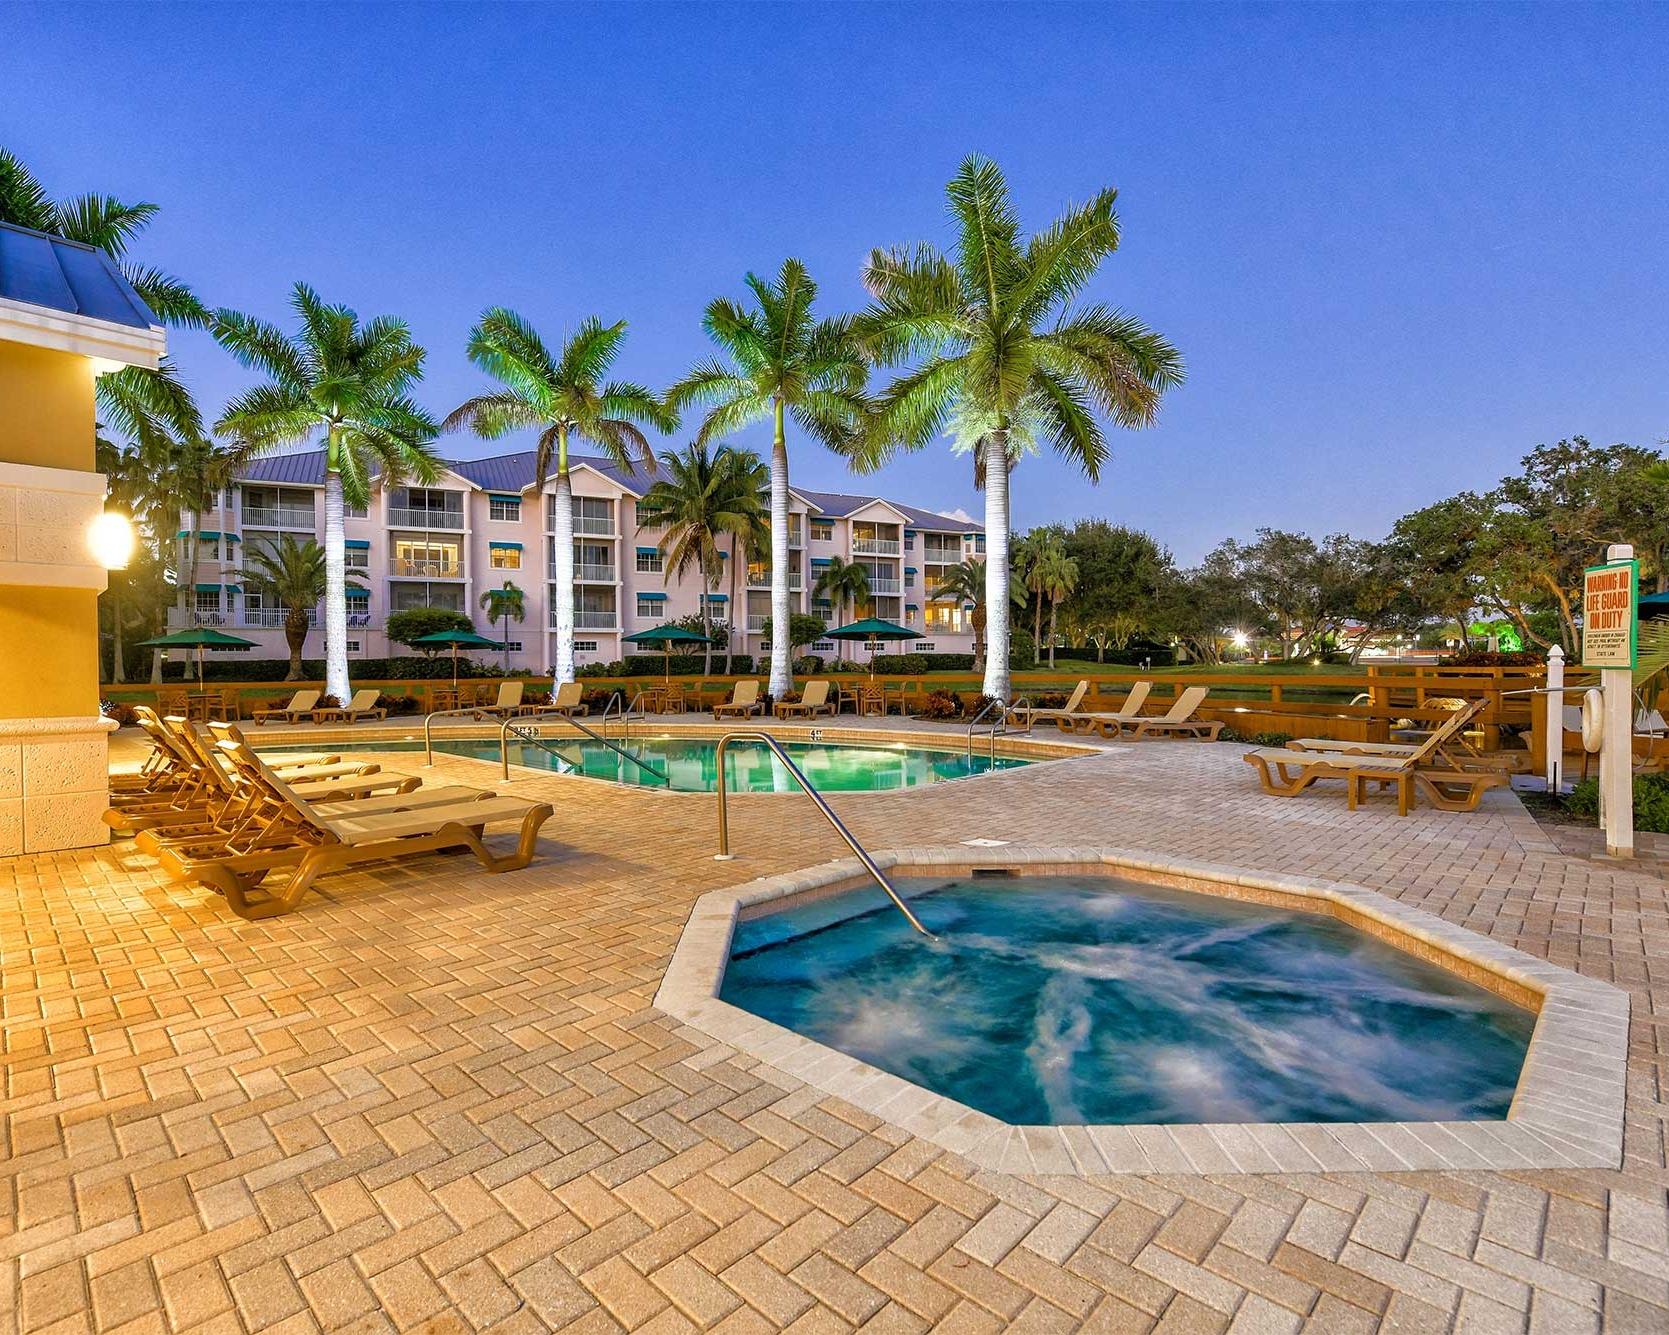 EDGEWATER at HIDDEN BAY - 56 Luxury CondominiumsOsprey, FL